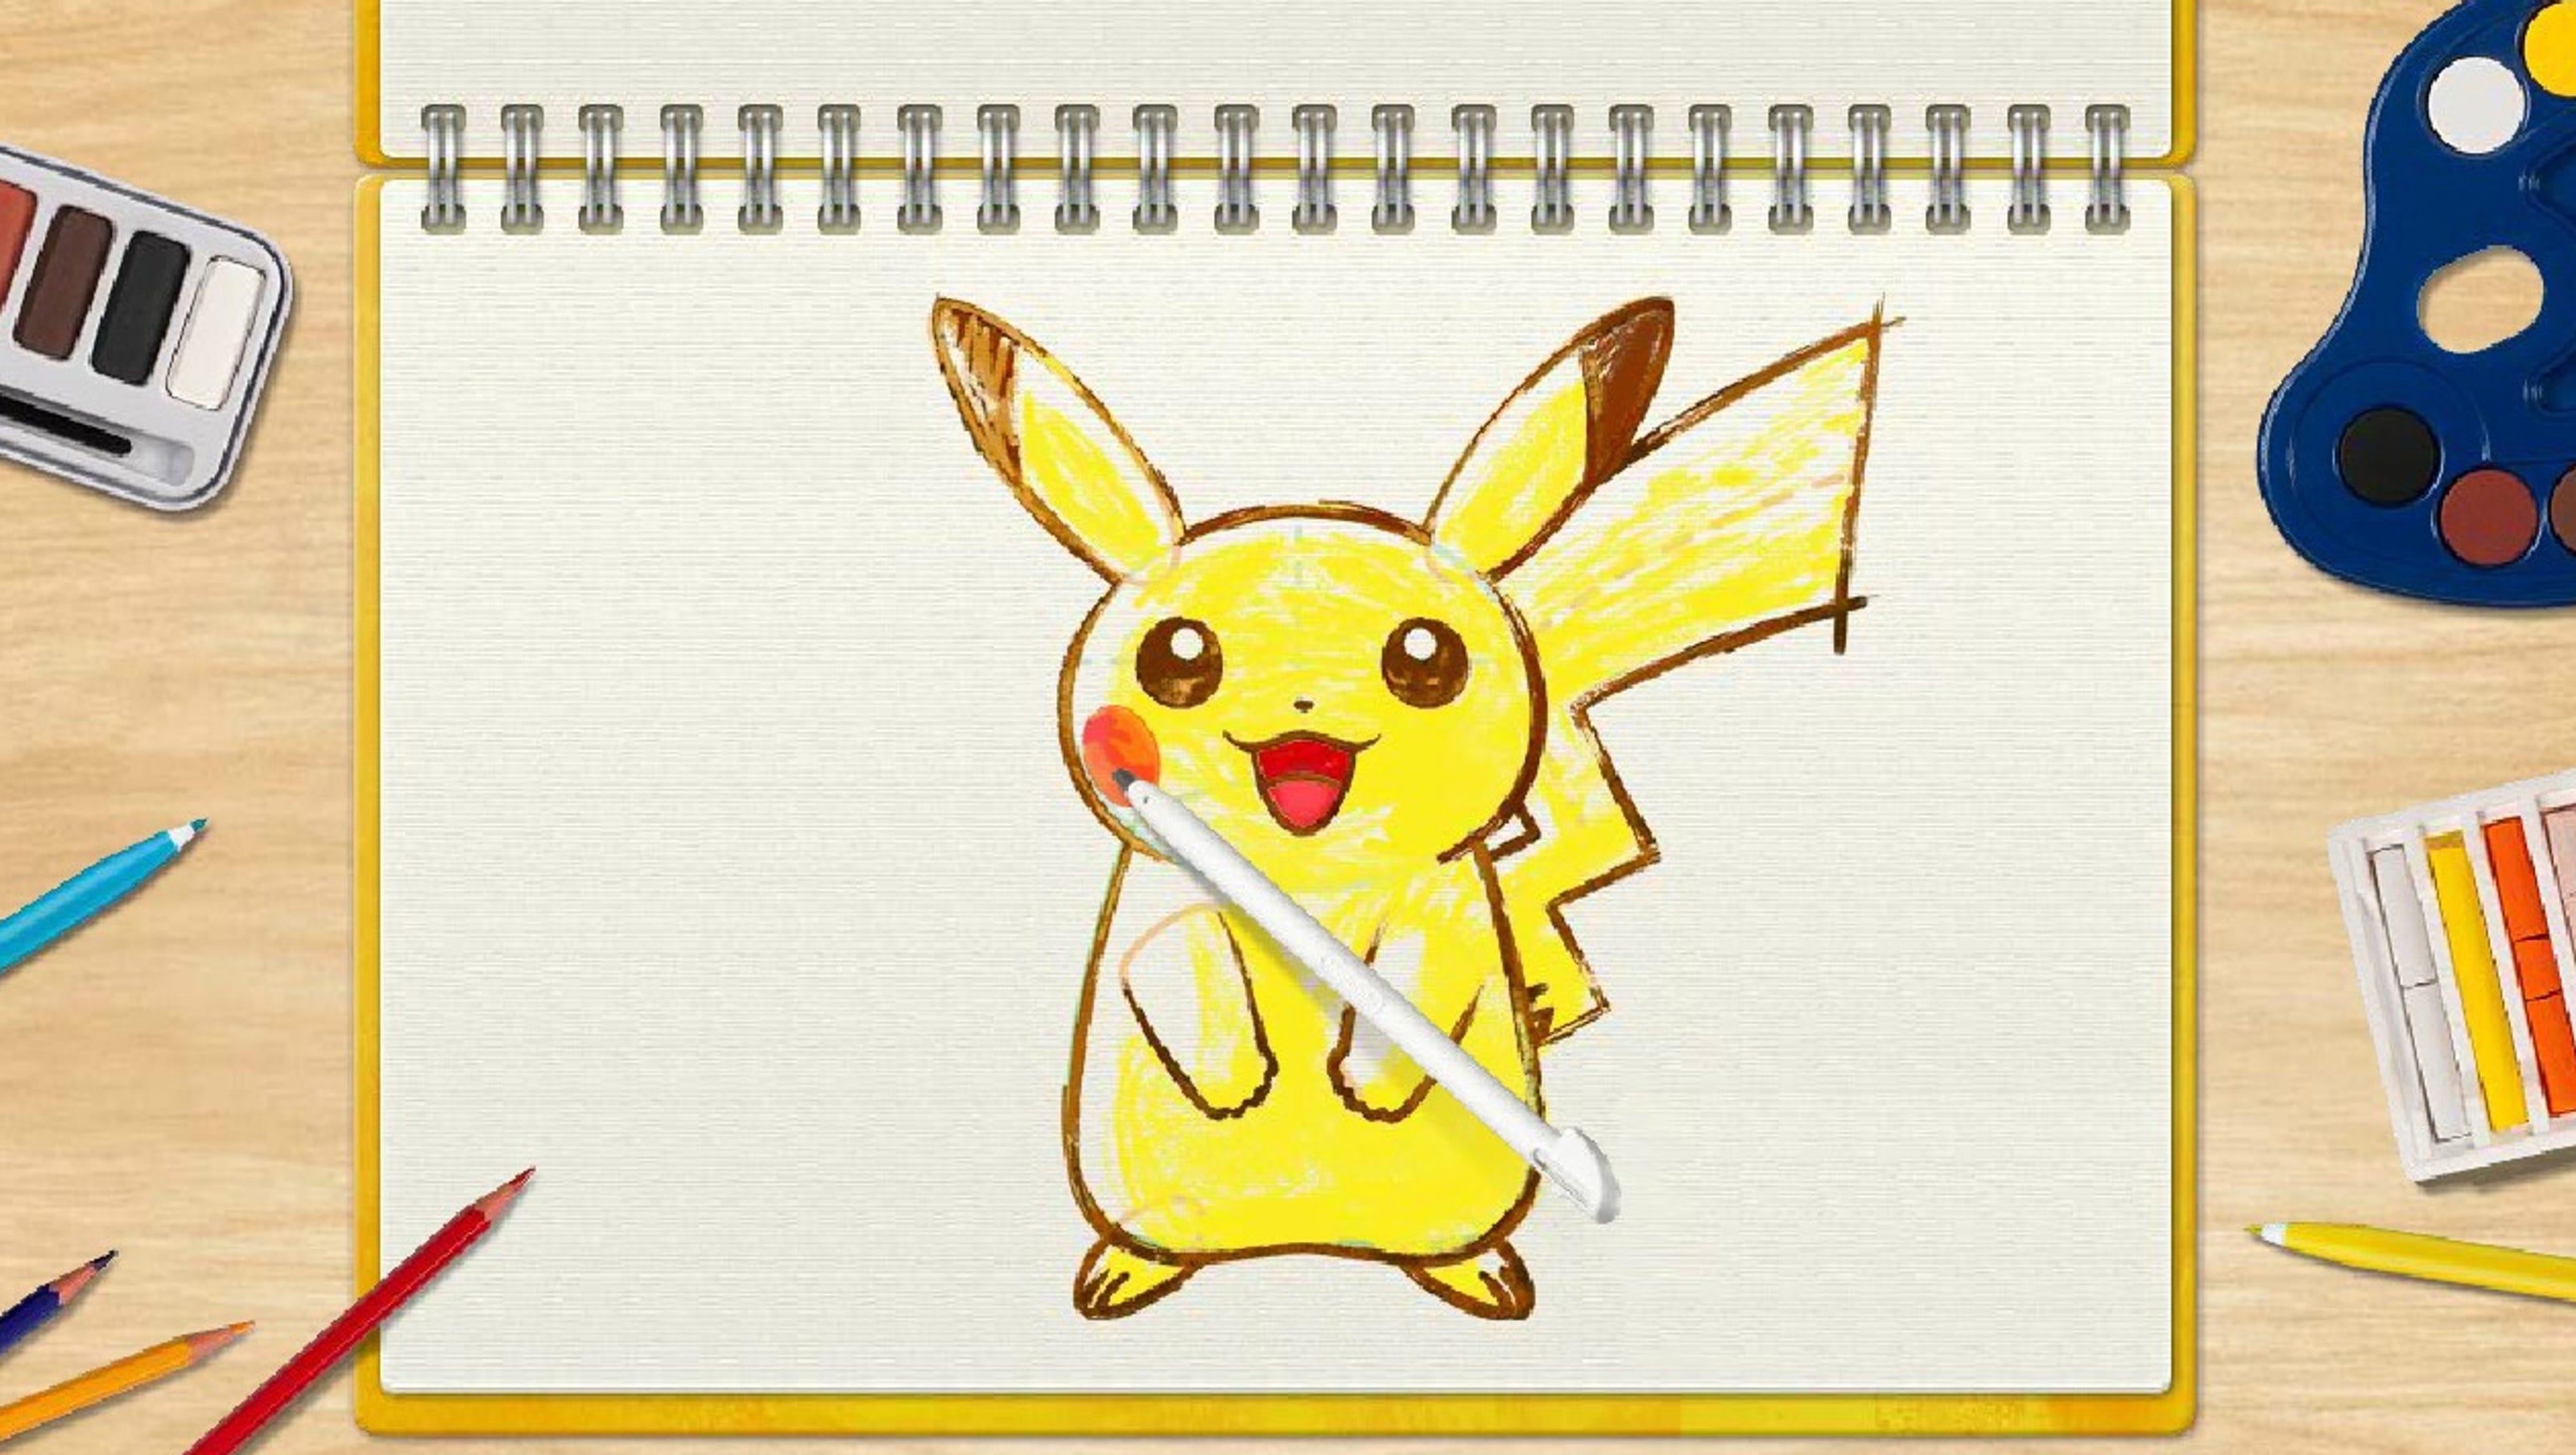 Gotta Draw Em All Pokemon Art Academy Review Technobubble